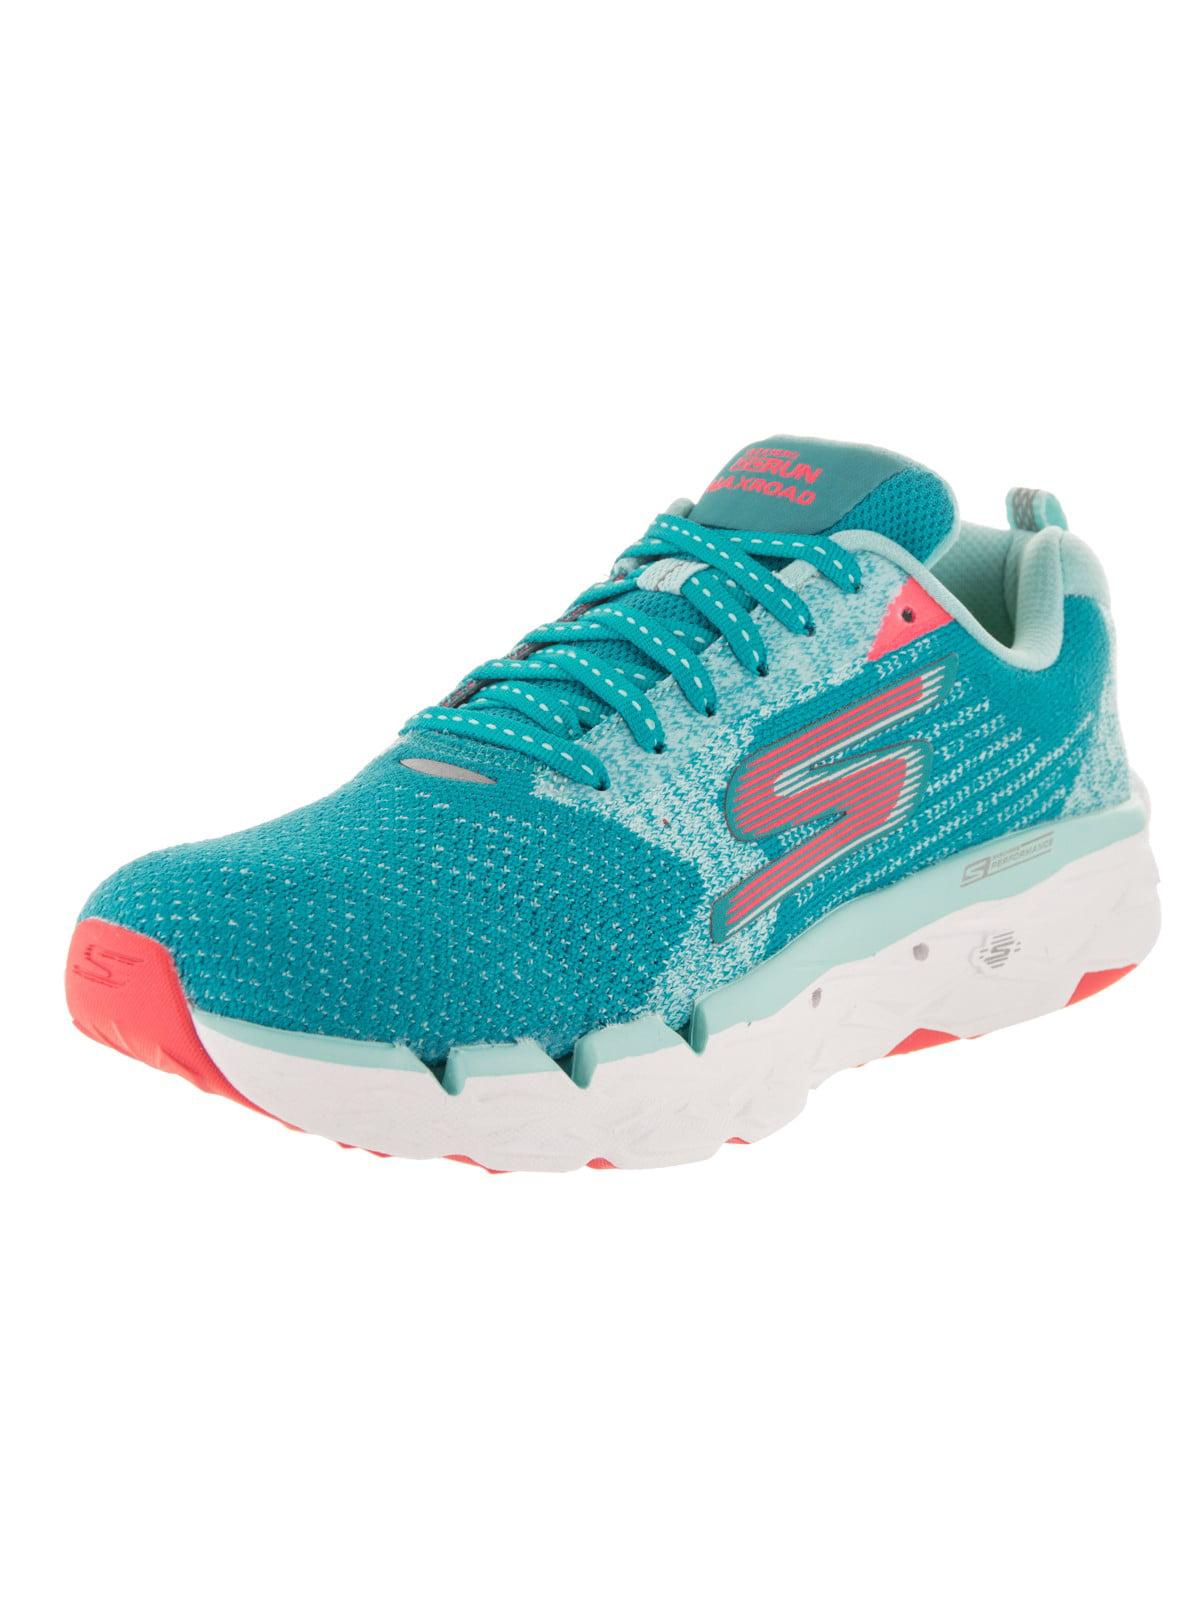 Skechers Women's Go Run Maxroad 3 Ultra Running Shoe